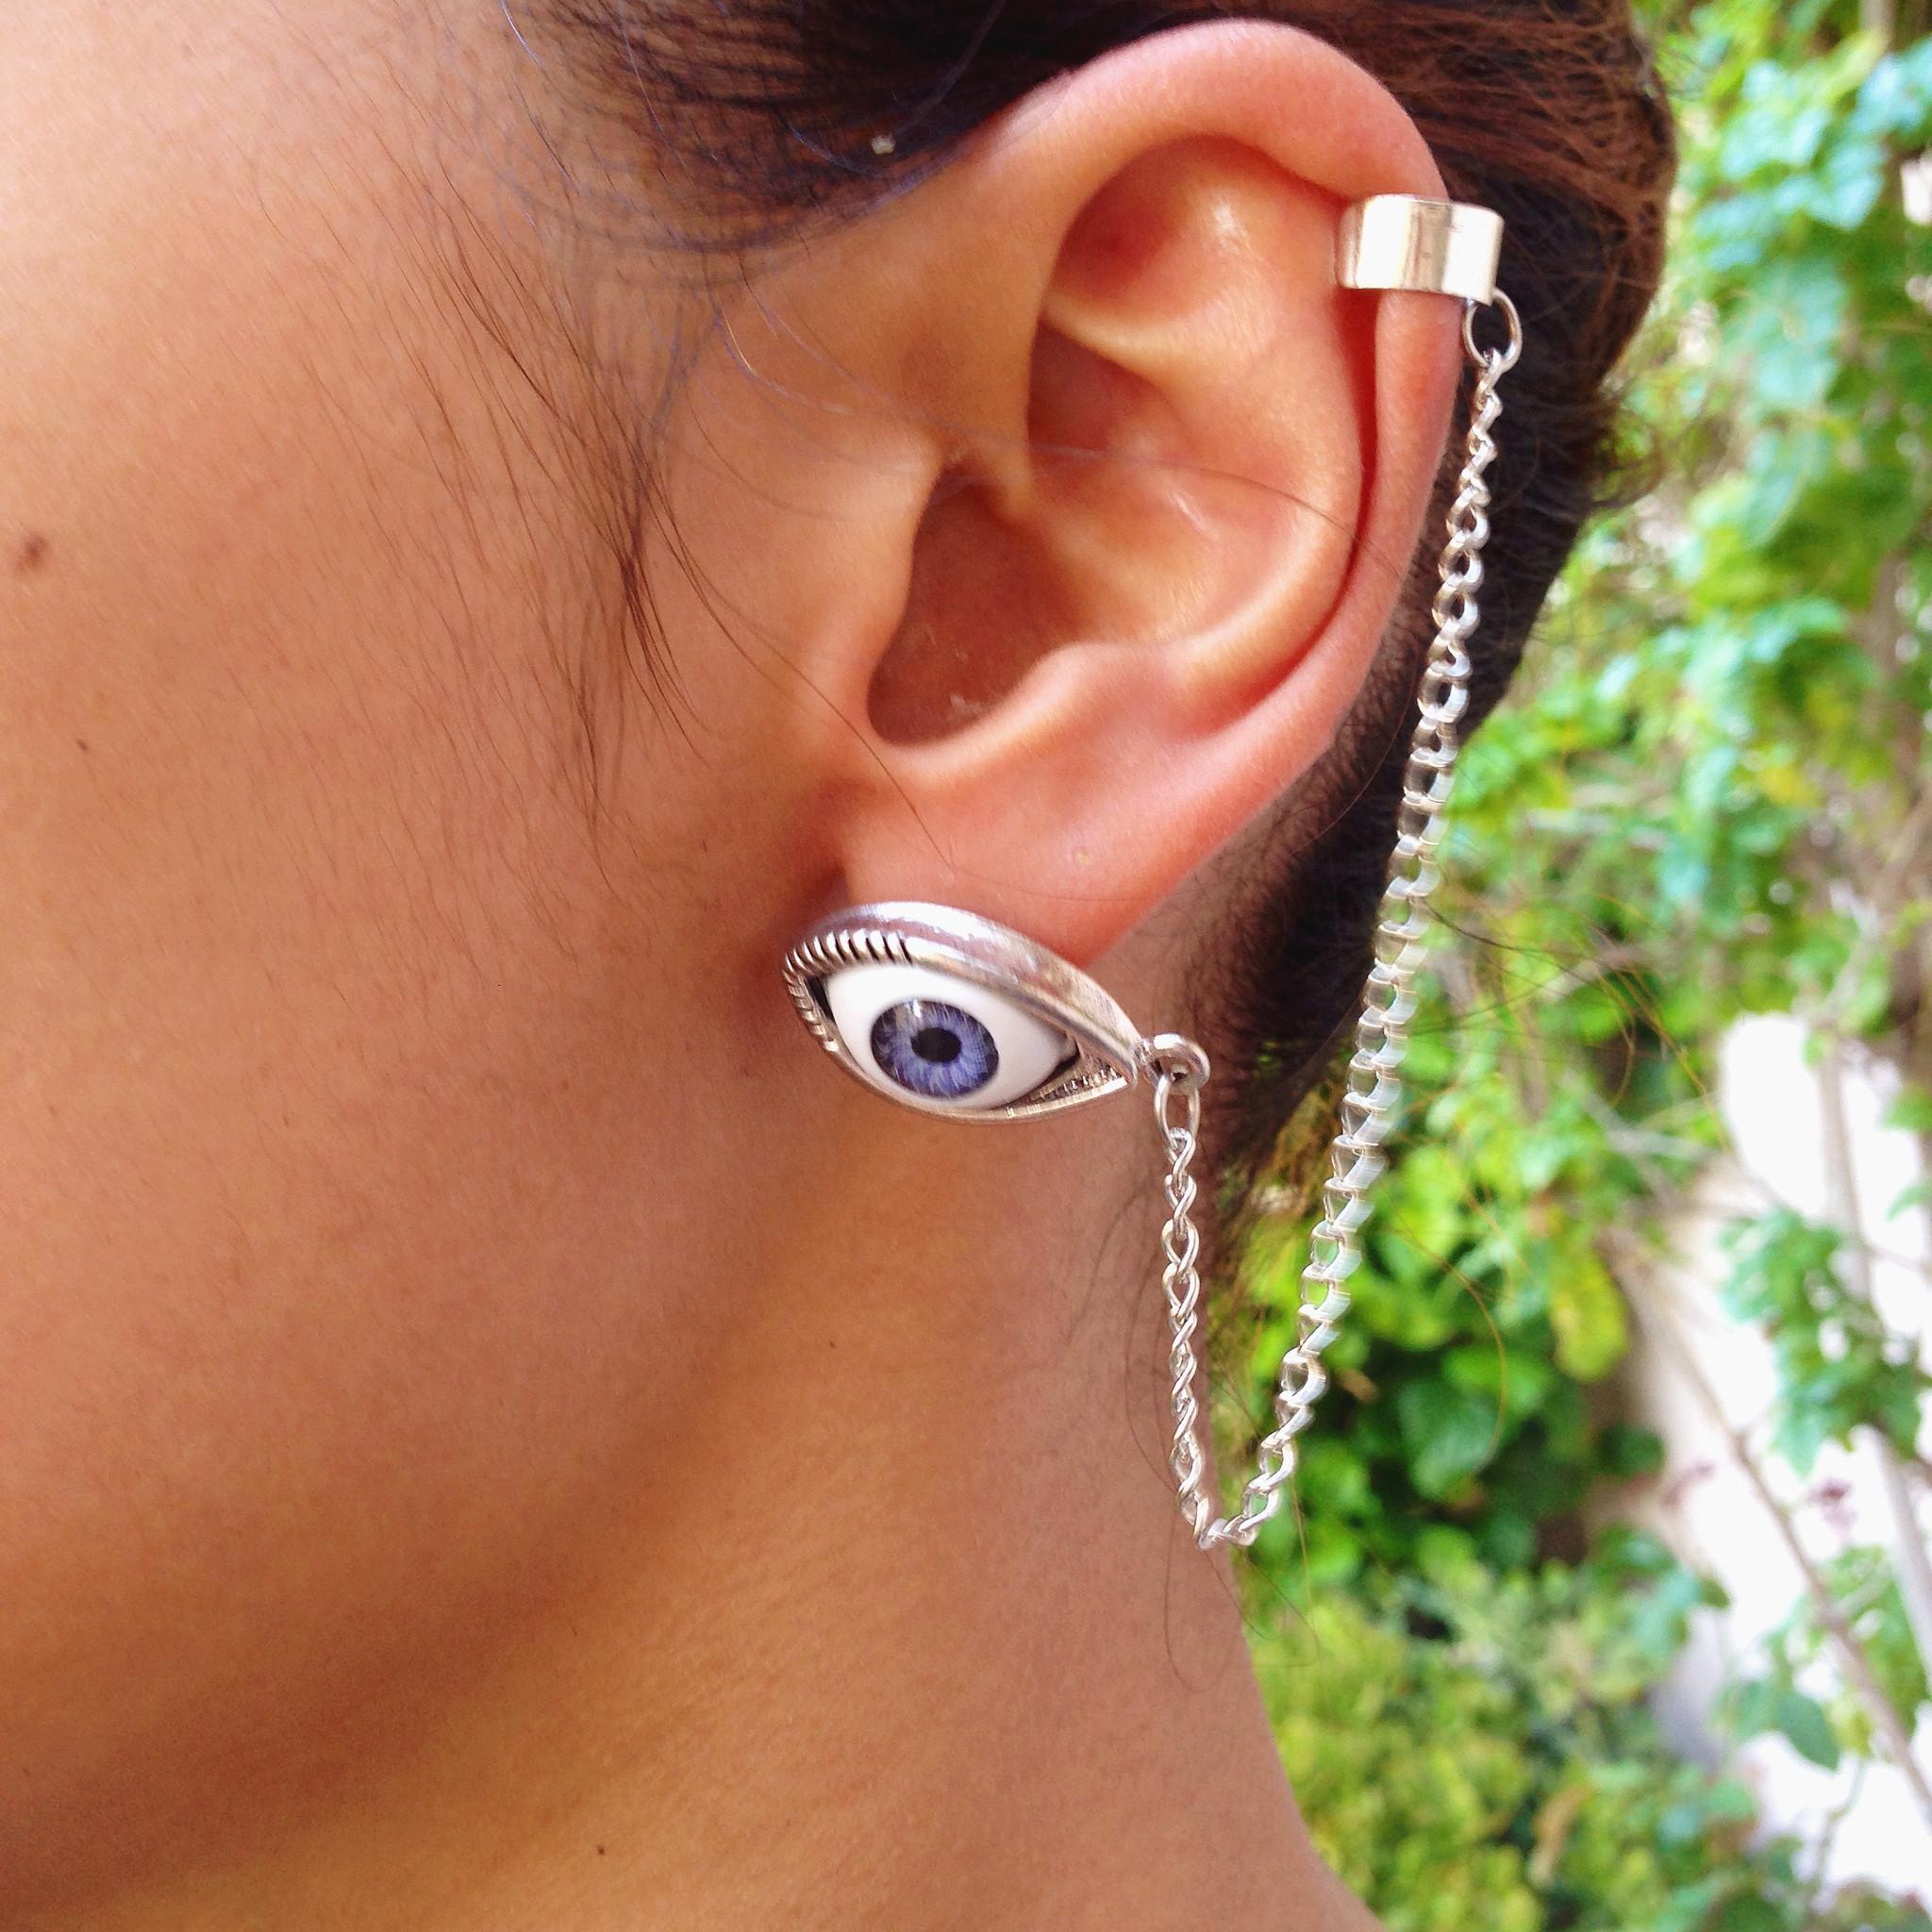 Evil eye ear cuff chain – gold soul